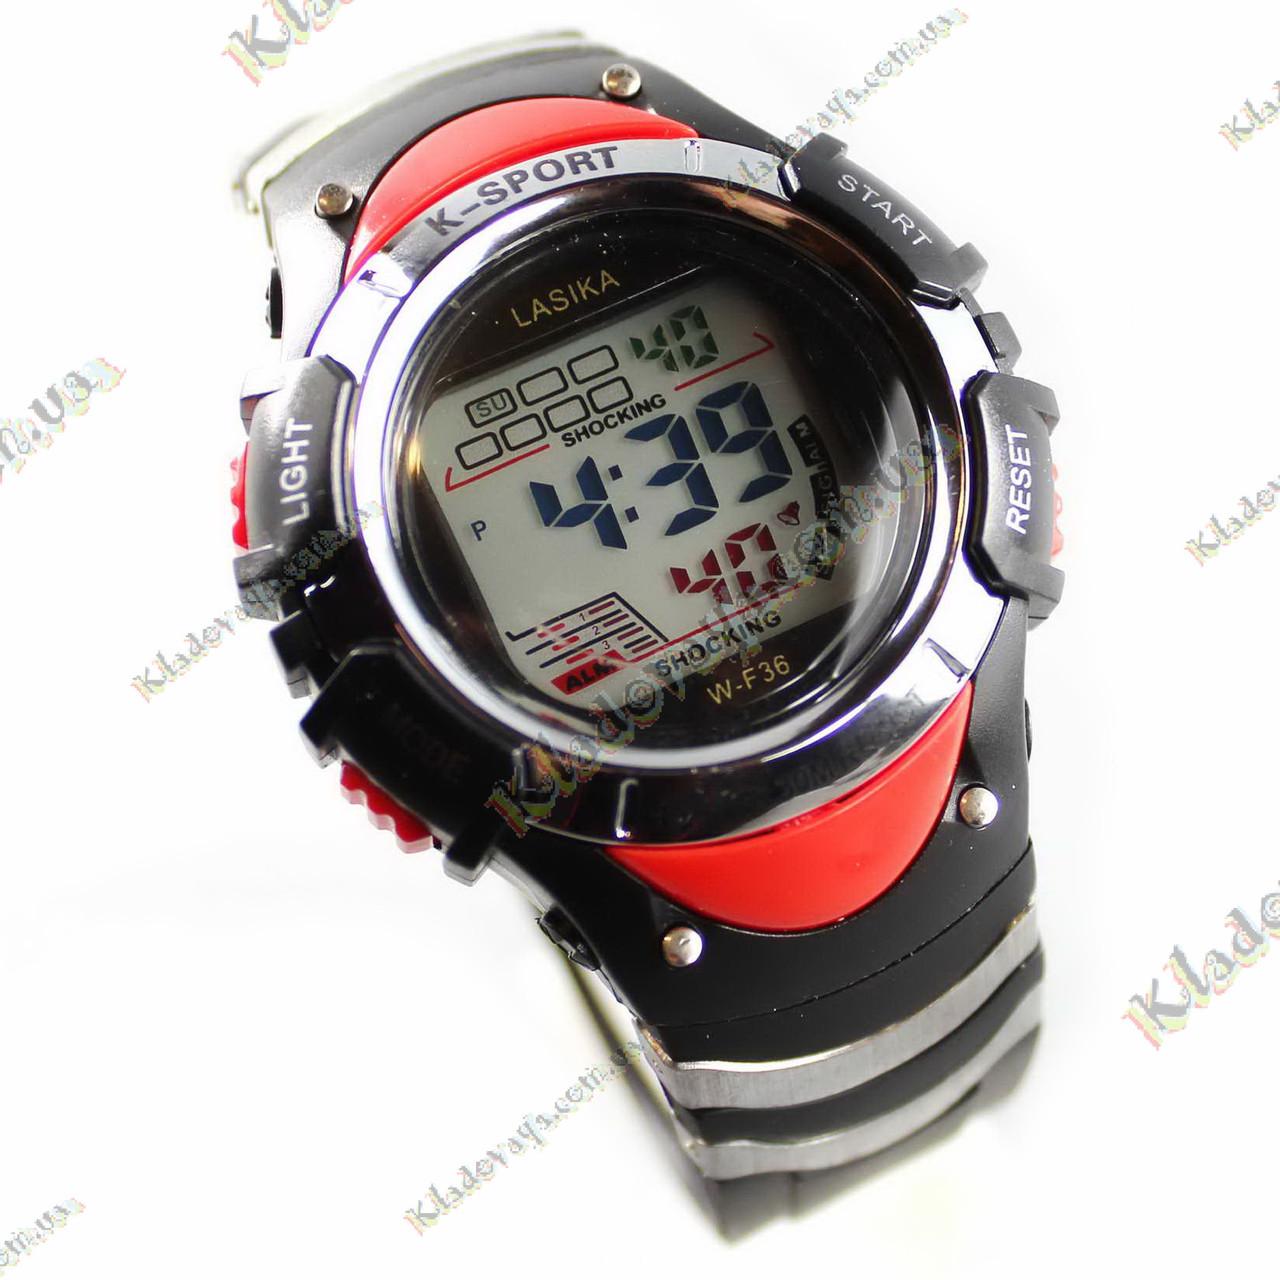 Водонепроницаемые часы Lasika RED 3 атм, фото 1